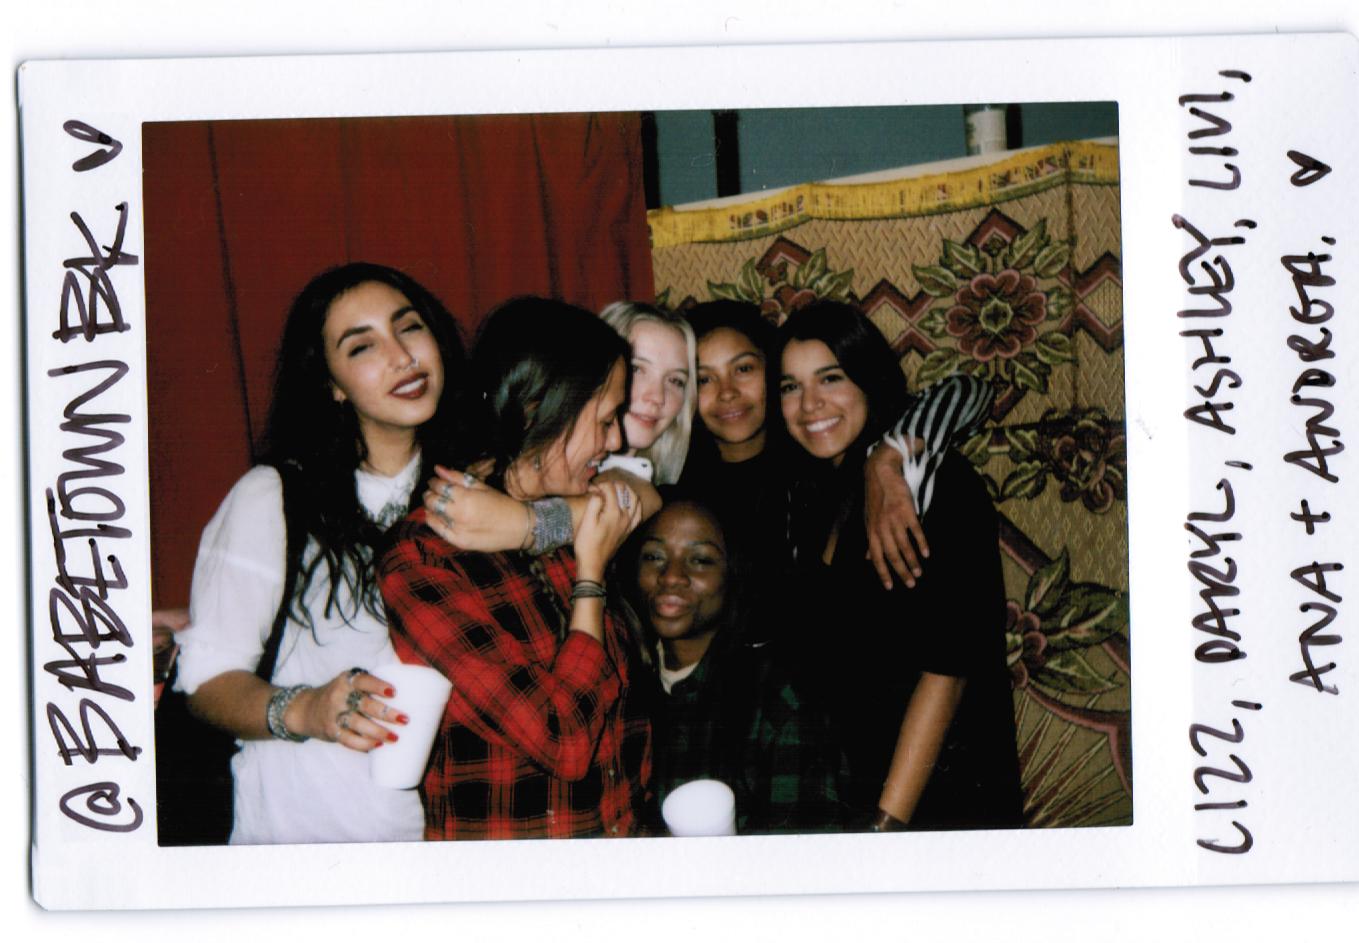 42 BUHBYEBTBK_Lizz Jardim + Daryl Nuhn + Ashley Harte + Olivia Seally + Ana Velazquez + Drea Tara.jpg